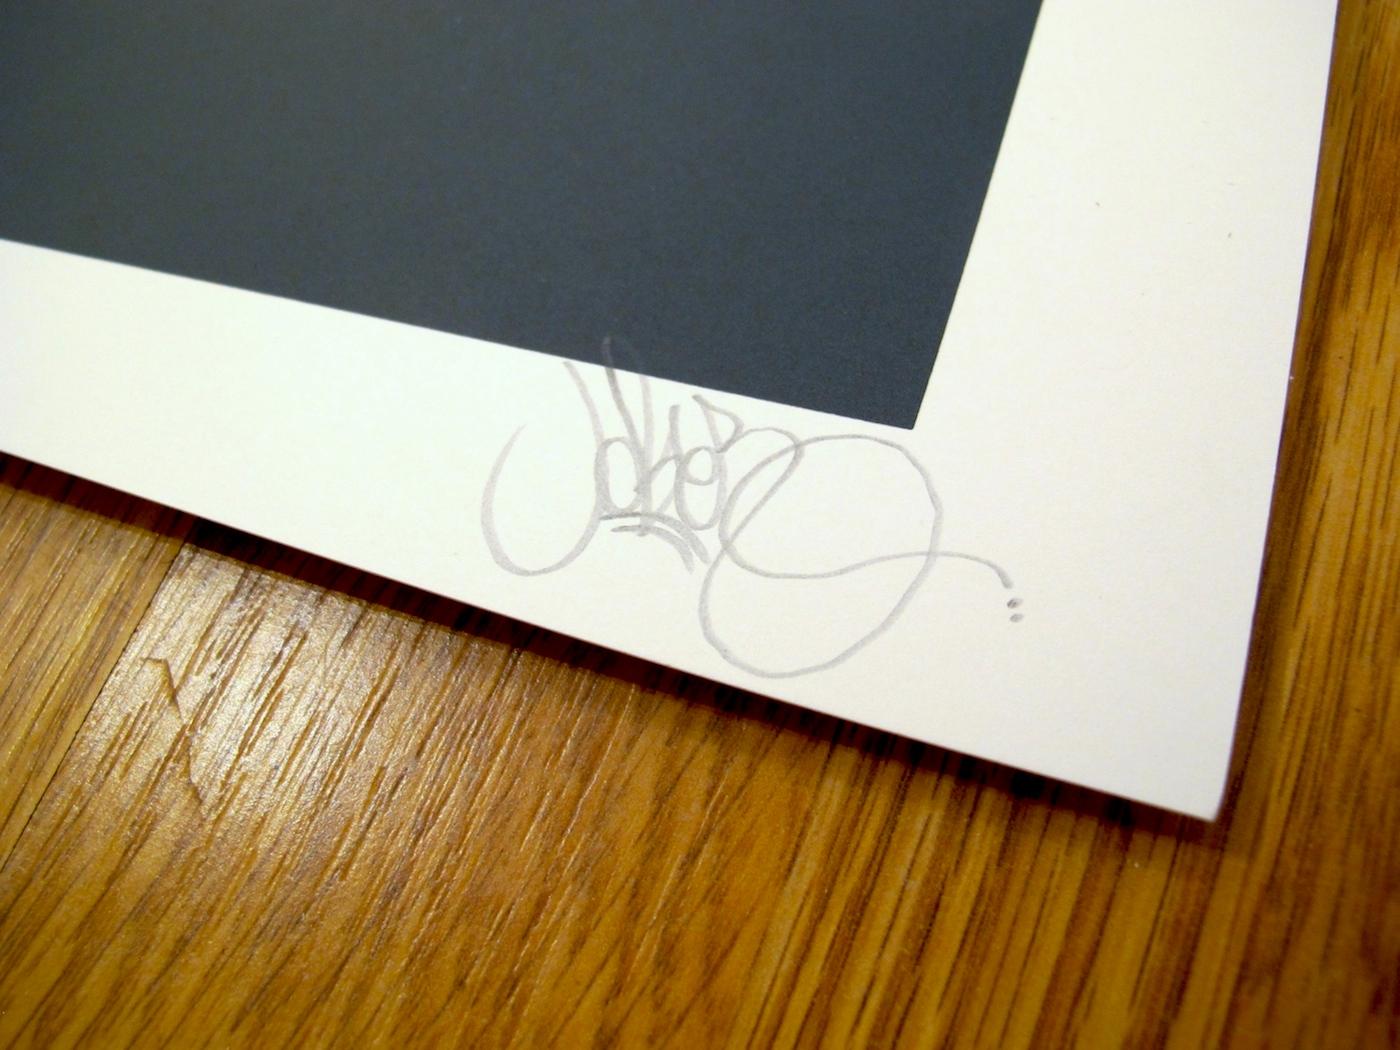 SKIN_Signature.jpg